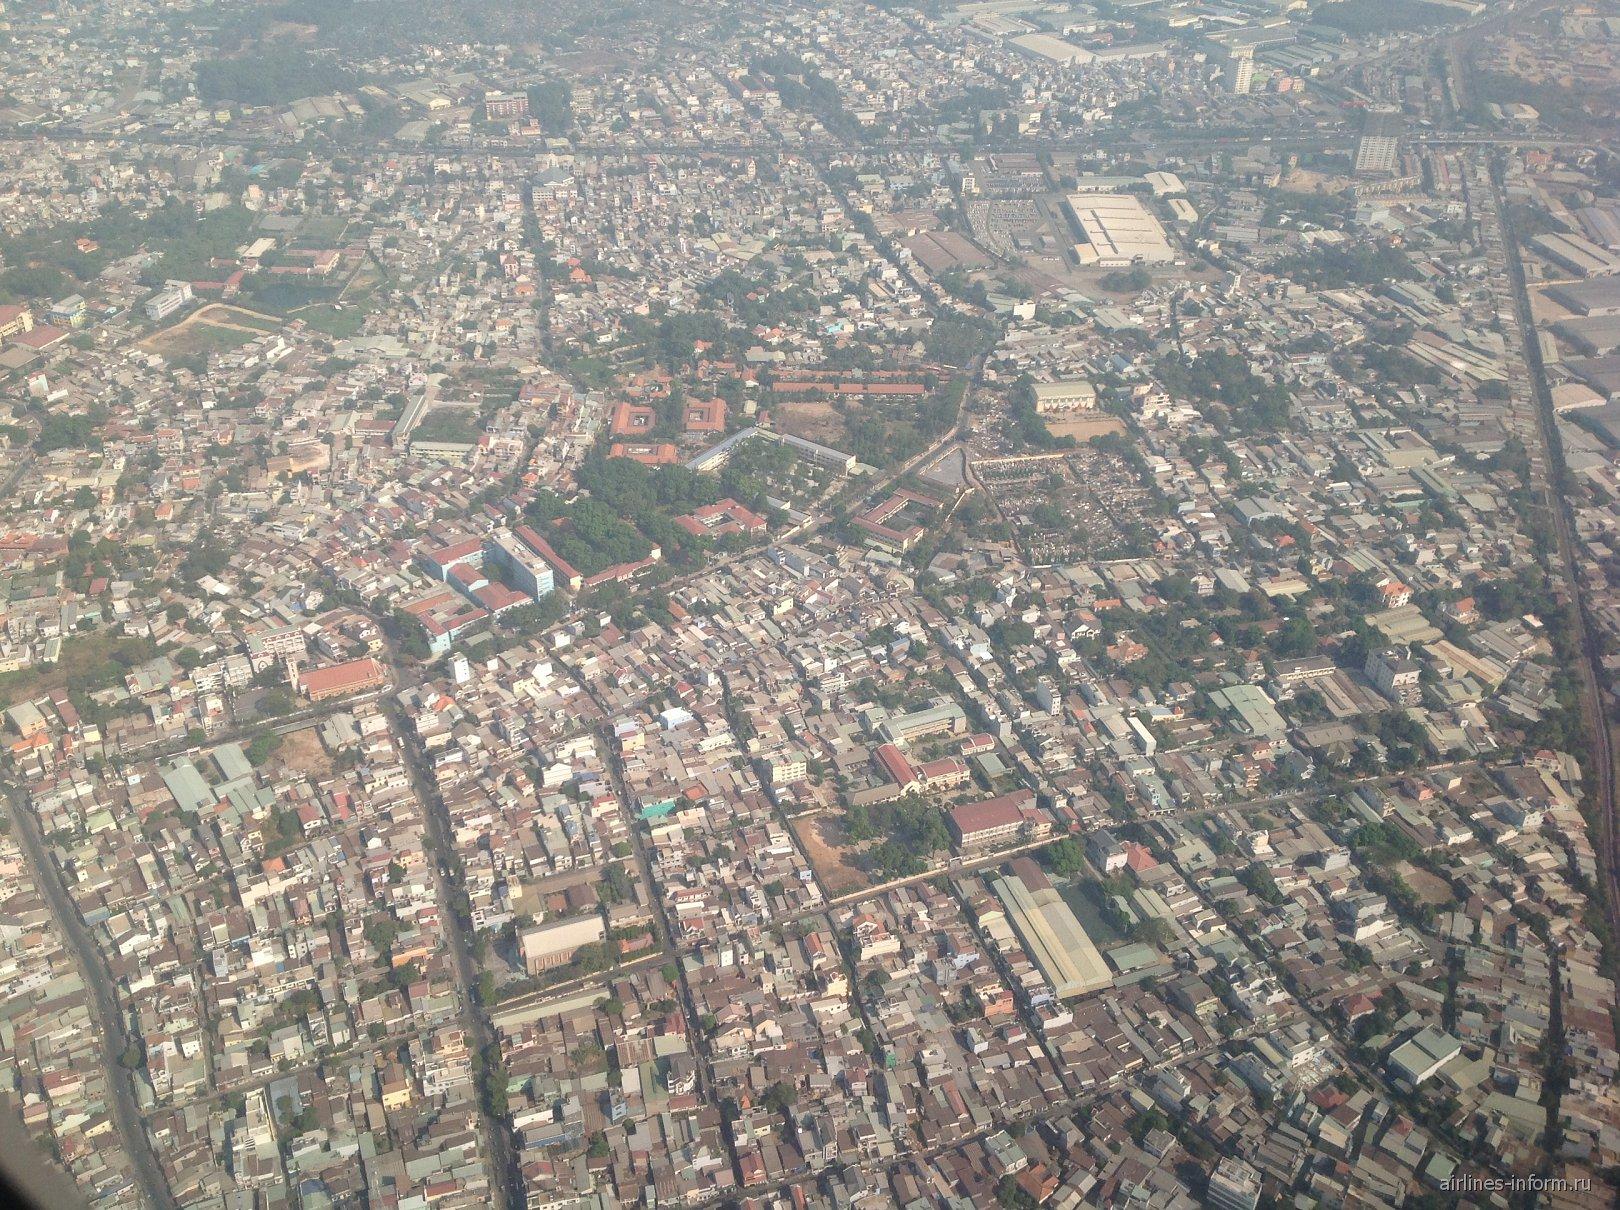 Жилые кварталы во Вьетнаме перед посадкой в аэропорту Хошимин Тан Сон Нхат